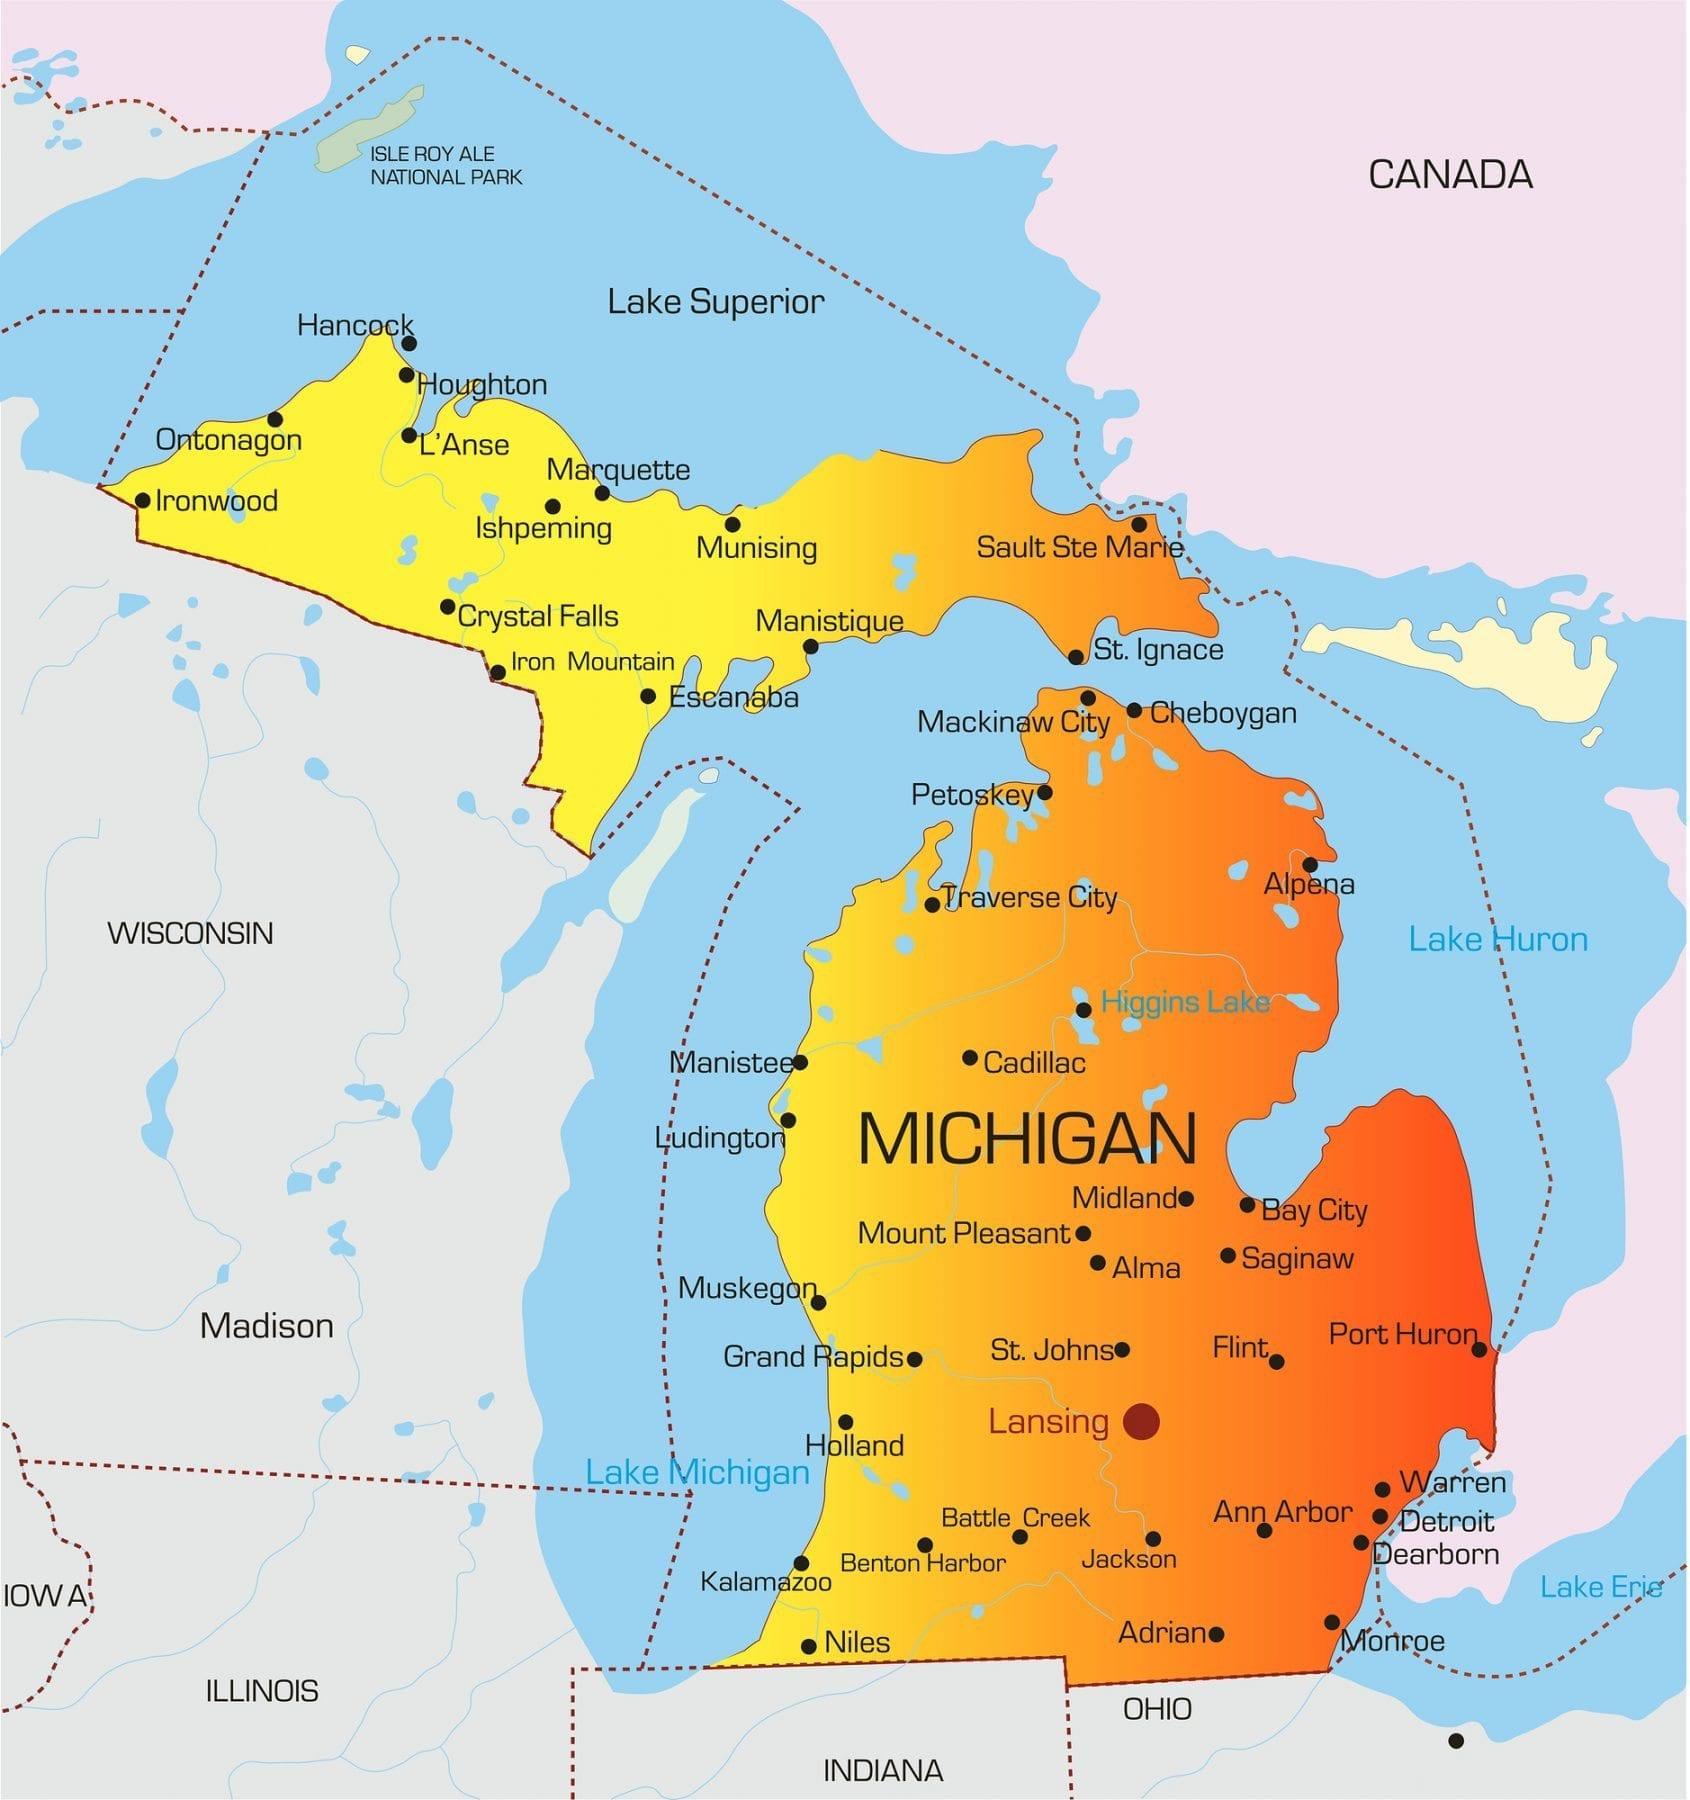 Michigan lpn requirements and training programs michigan xflitez Gallery